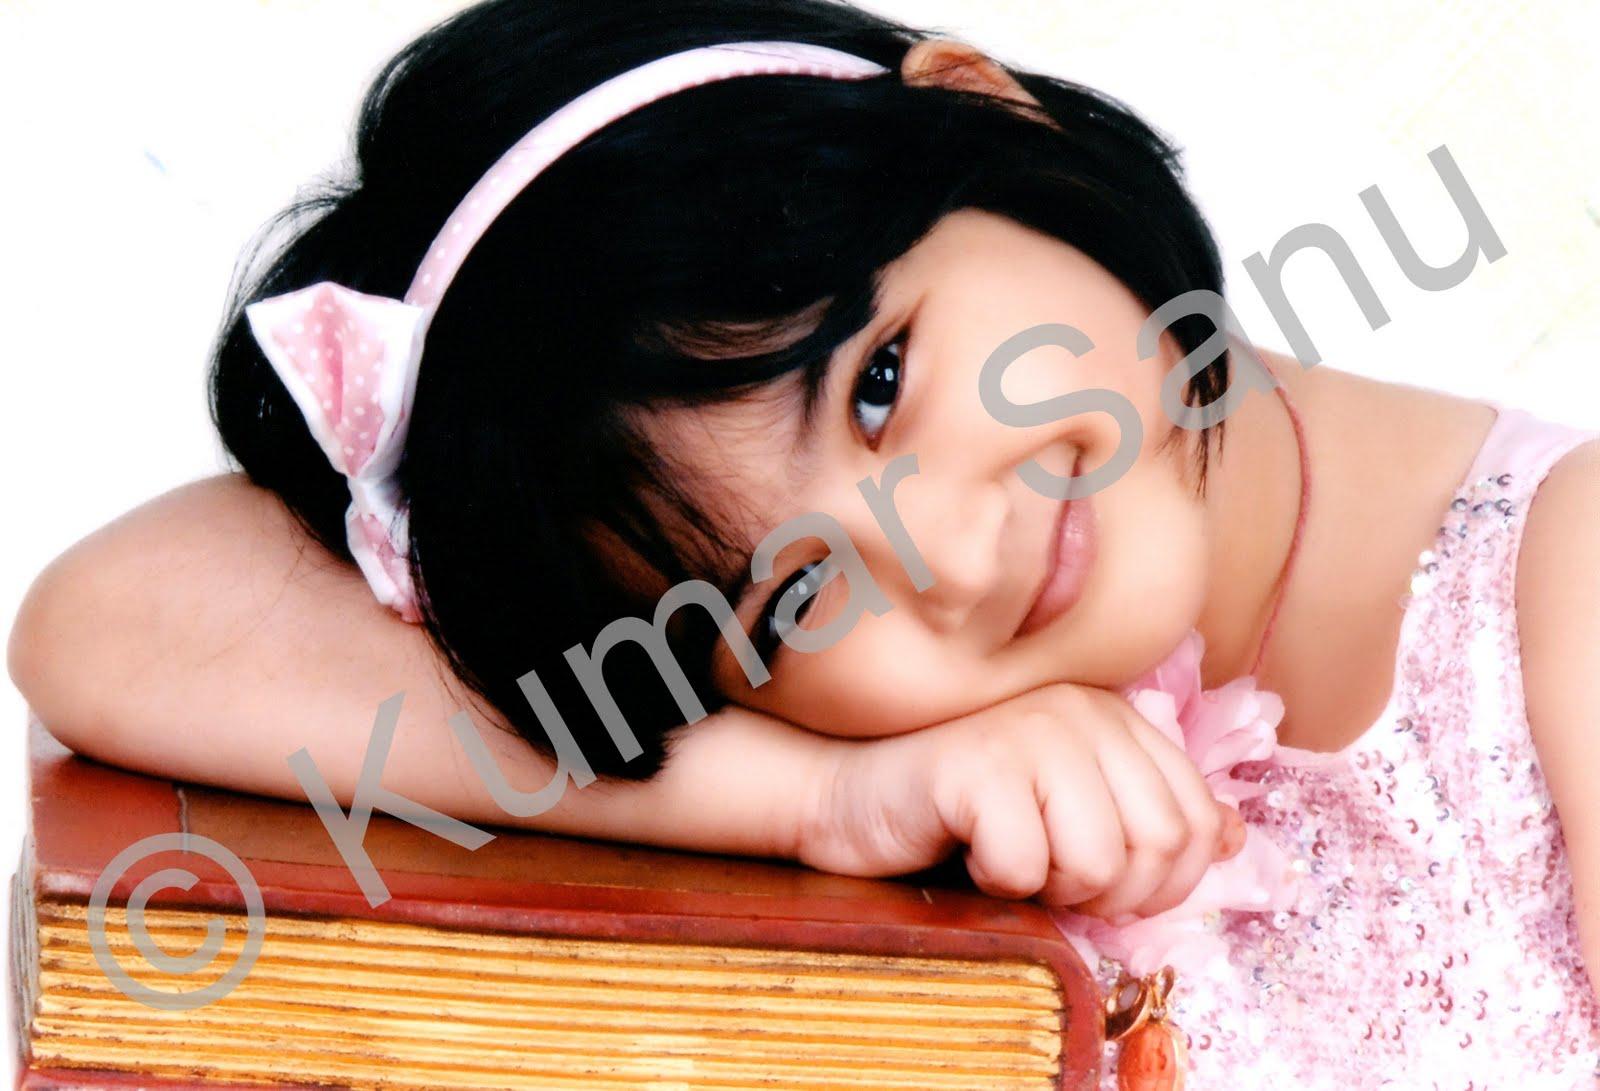 http://2.bp.blogspot.com/_a7_k_3ALqAM/TP30S48fUTI/AAAAAAAABLI/y7DwnF85YaM/s1600/img001.jpg